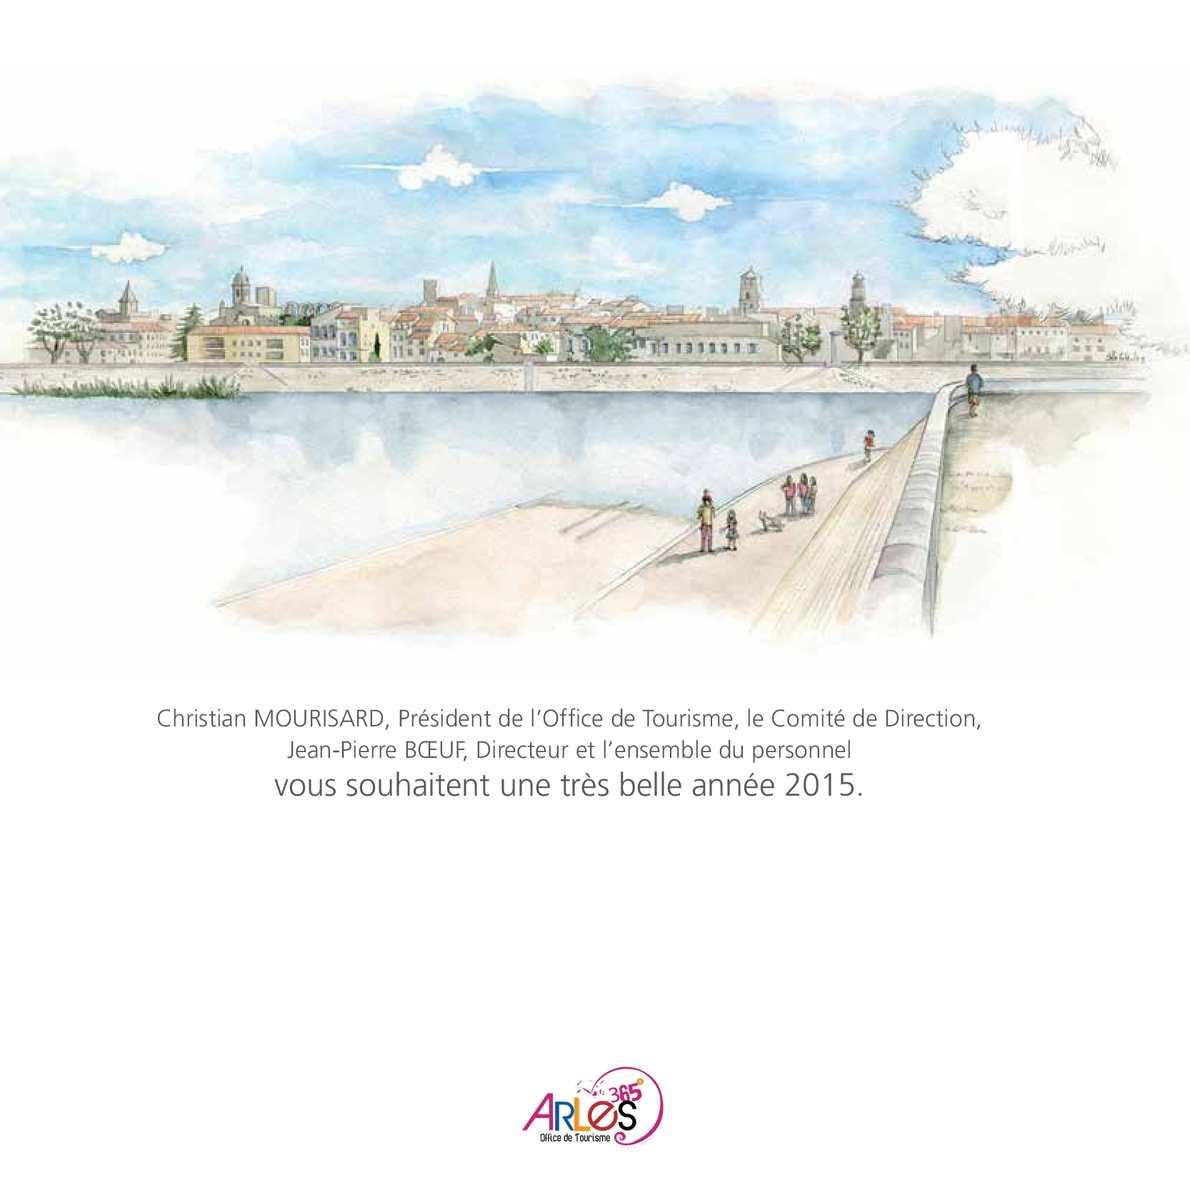 Calam o calendrier 2015 de l 39 office de tourisme d 39 arles - Office de tourisme de arles ...